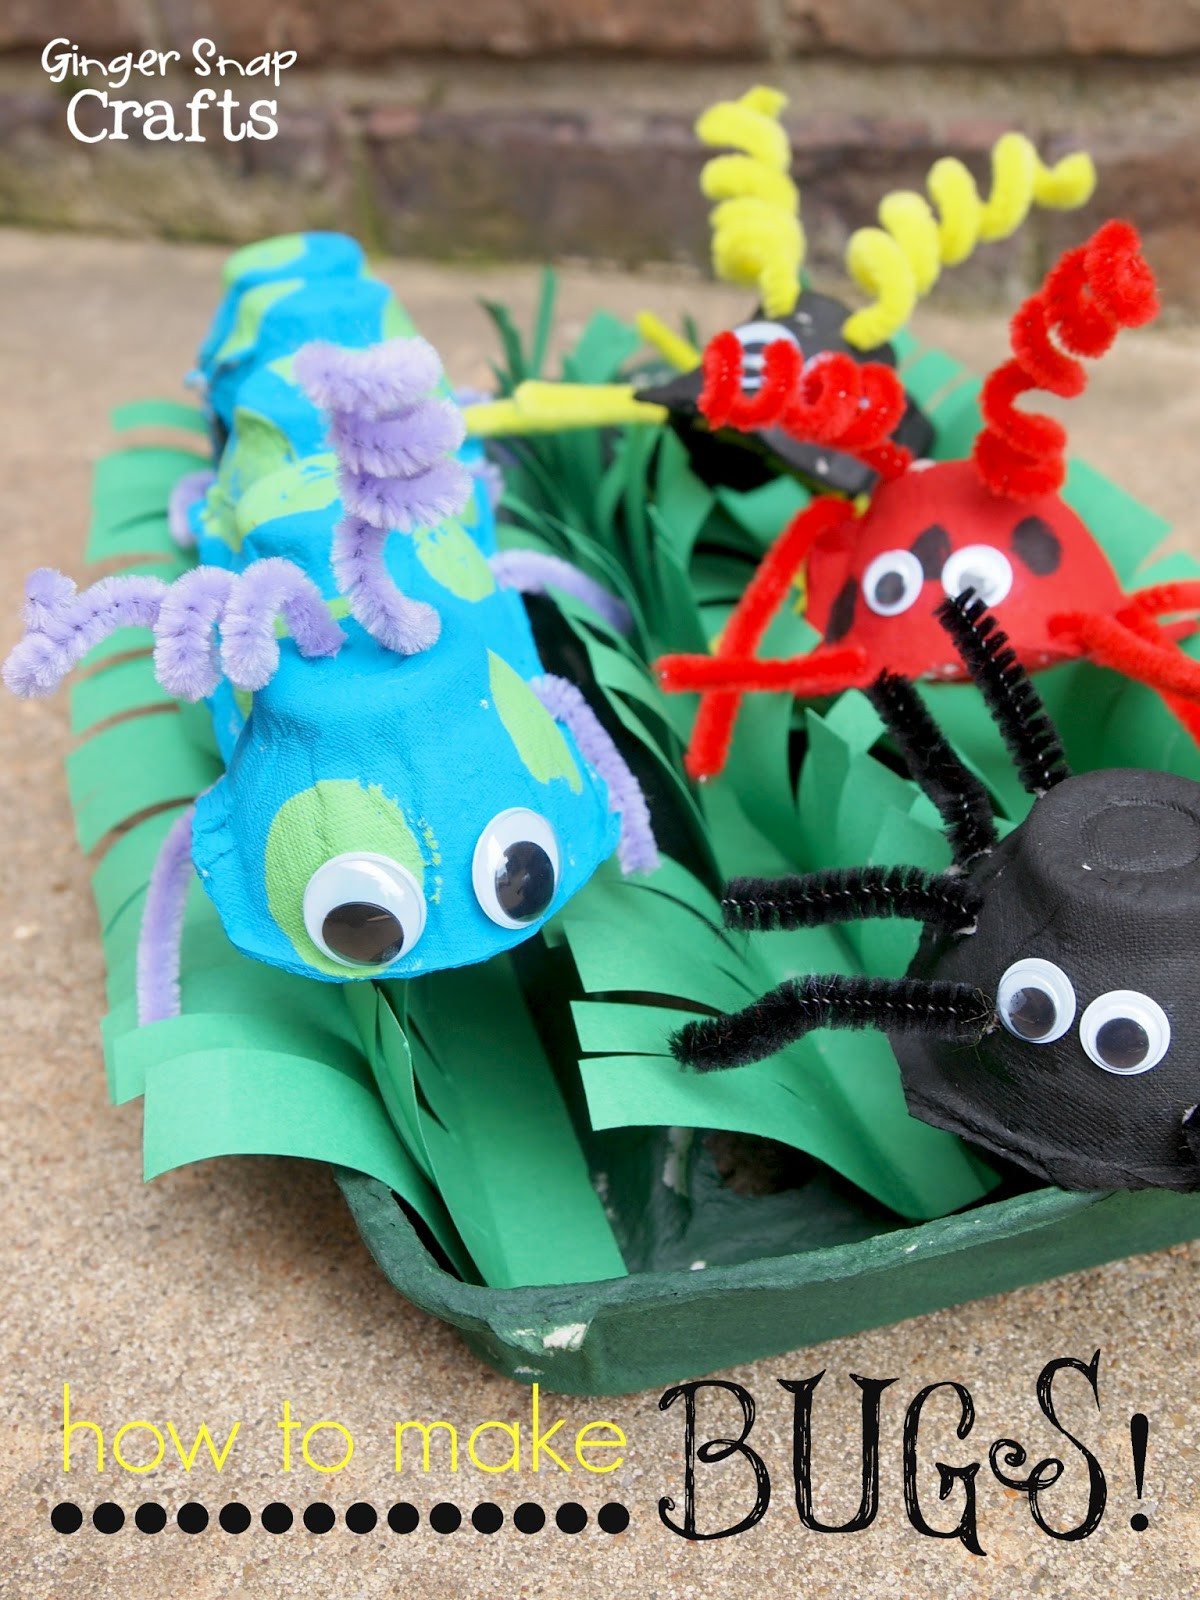 Ginger Snap Crafts Egg Carton Bugs Kid Craft Tutorial